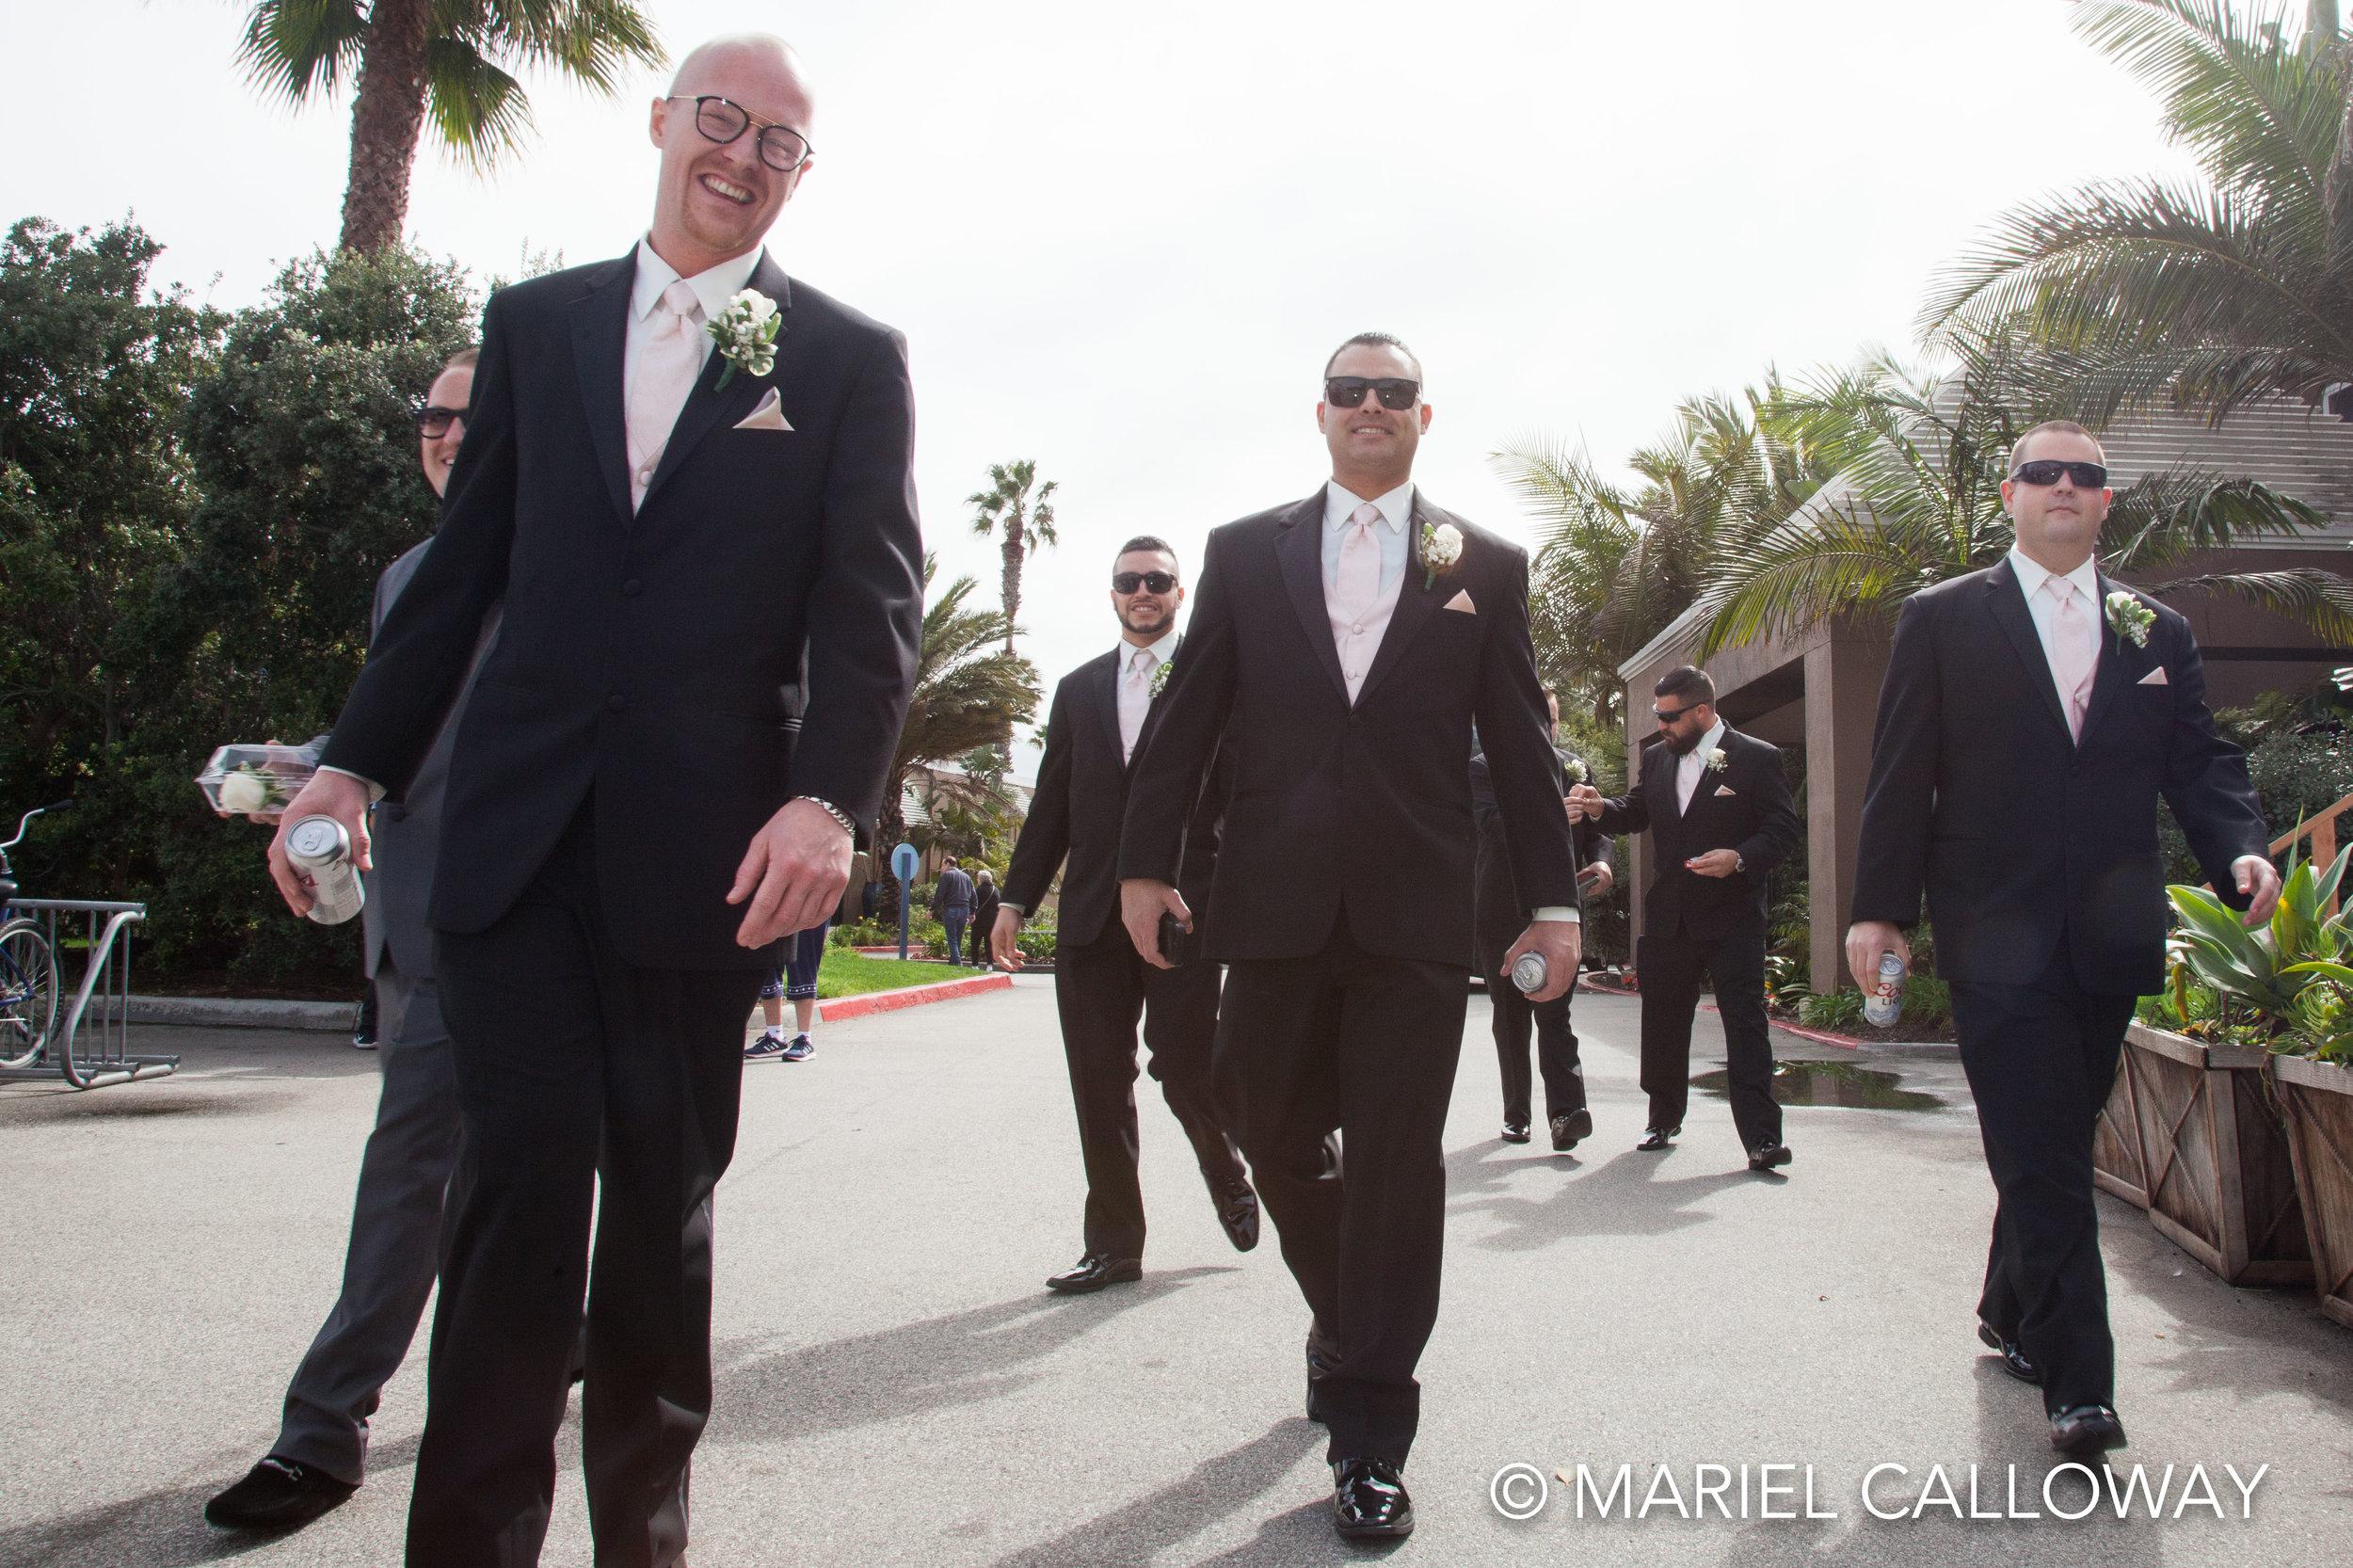 Mariel-Calloway-Los-Angeles-Wedding-Photography-Rossi-29.jpg